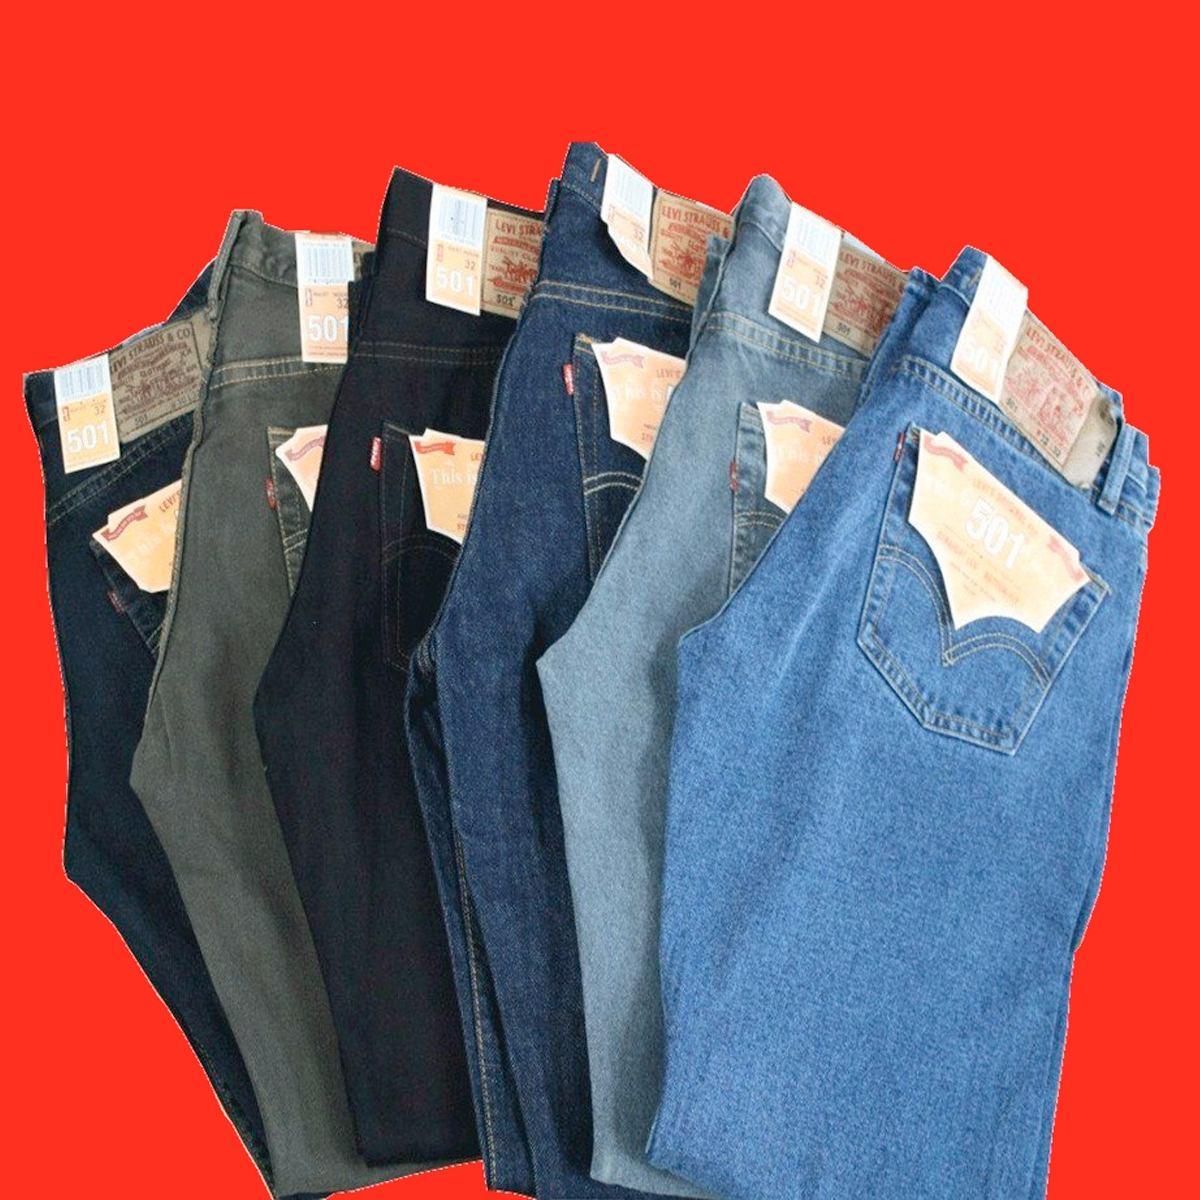 pantalones levis 501 100 importados corte original oferta bs 15 99 en mercado libre. Black Bedroom Furniture Sets. Home Design Ideas